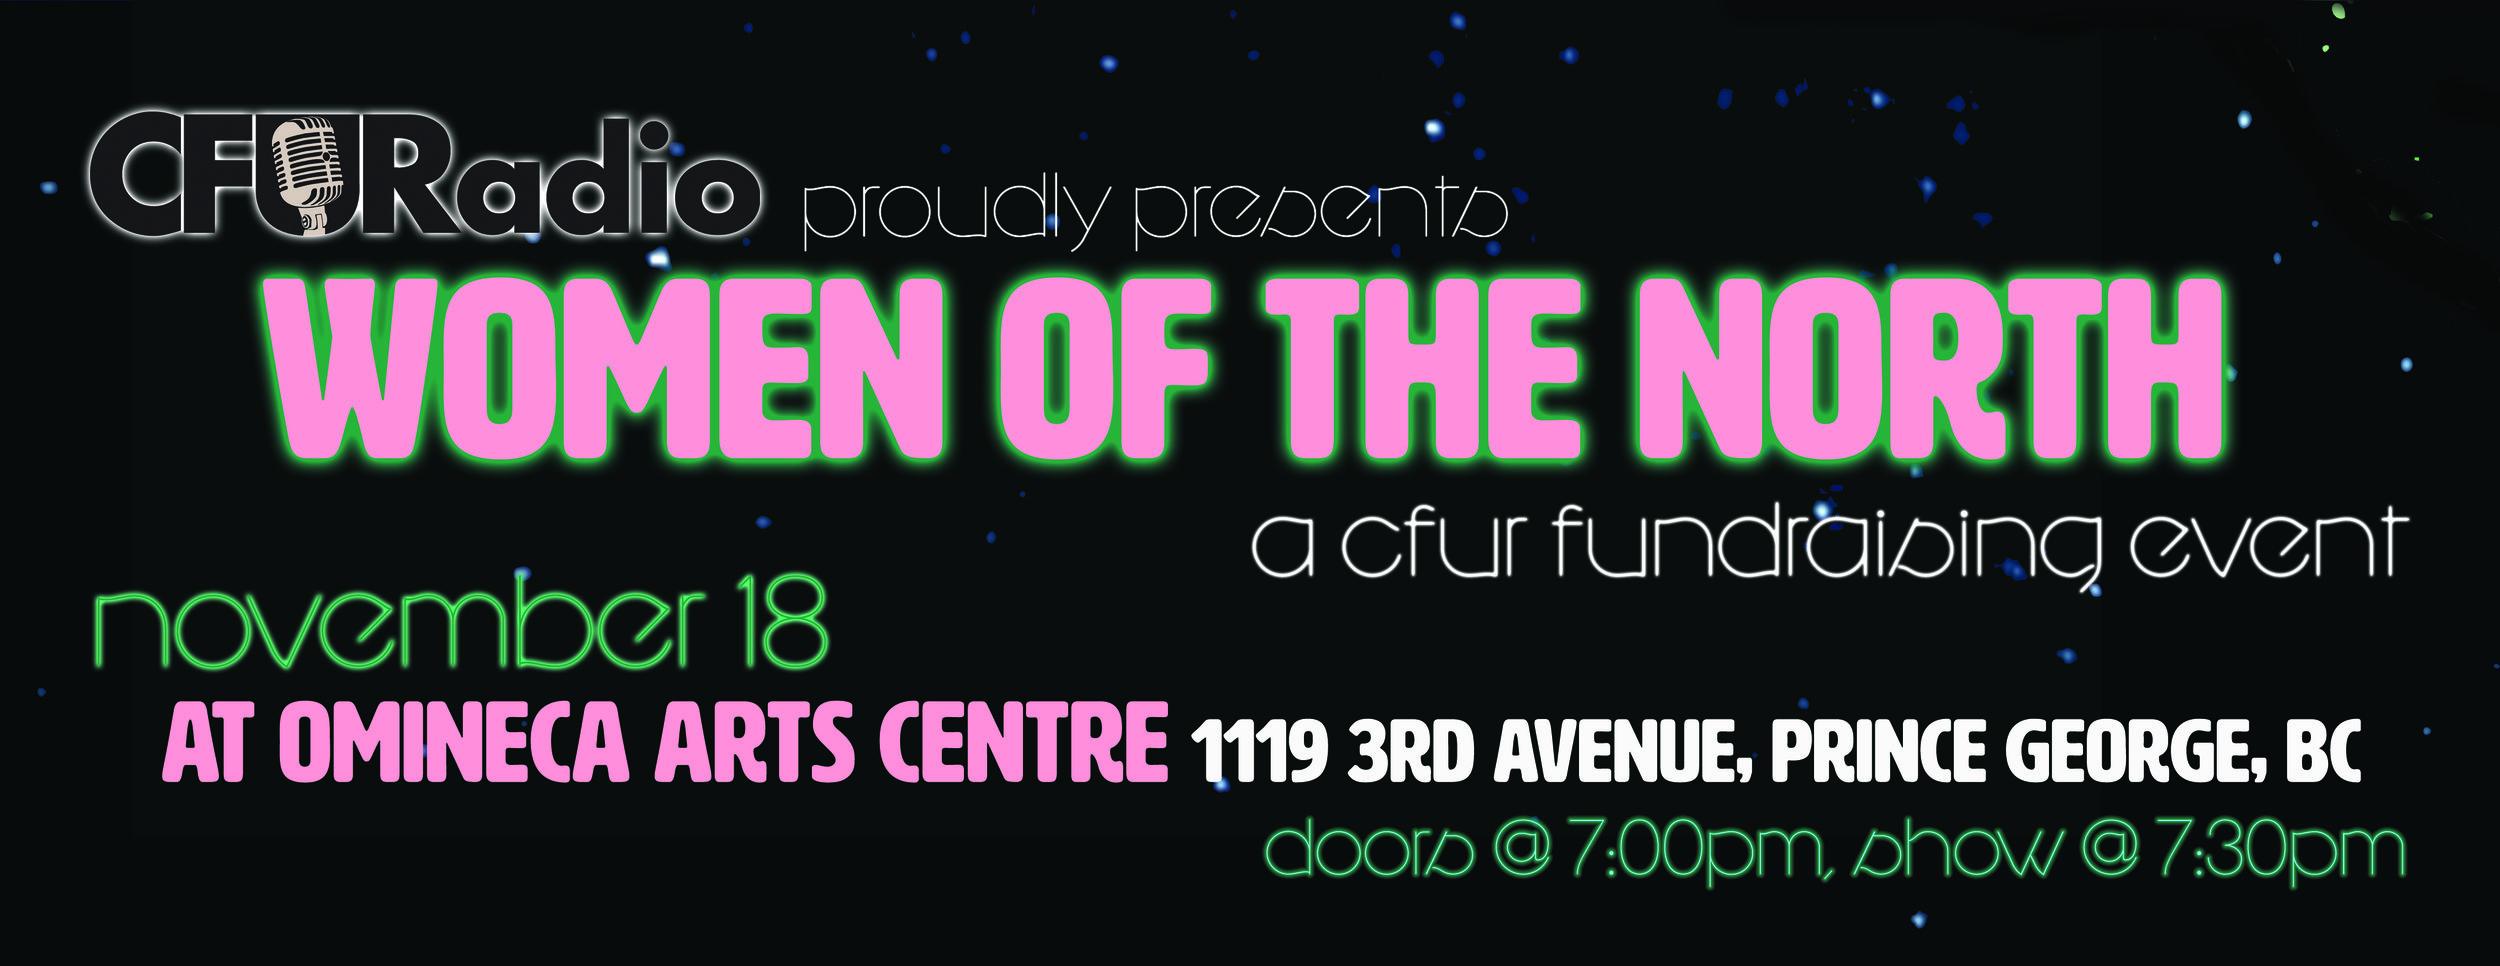 Women of the North - a CFUR Showcase